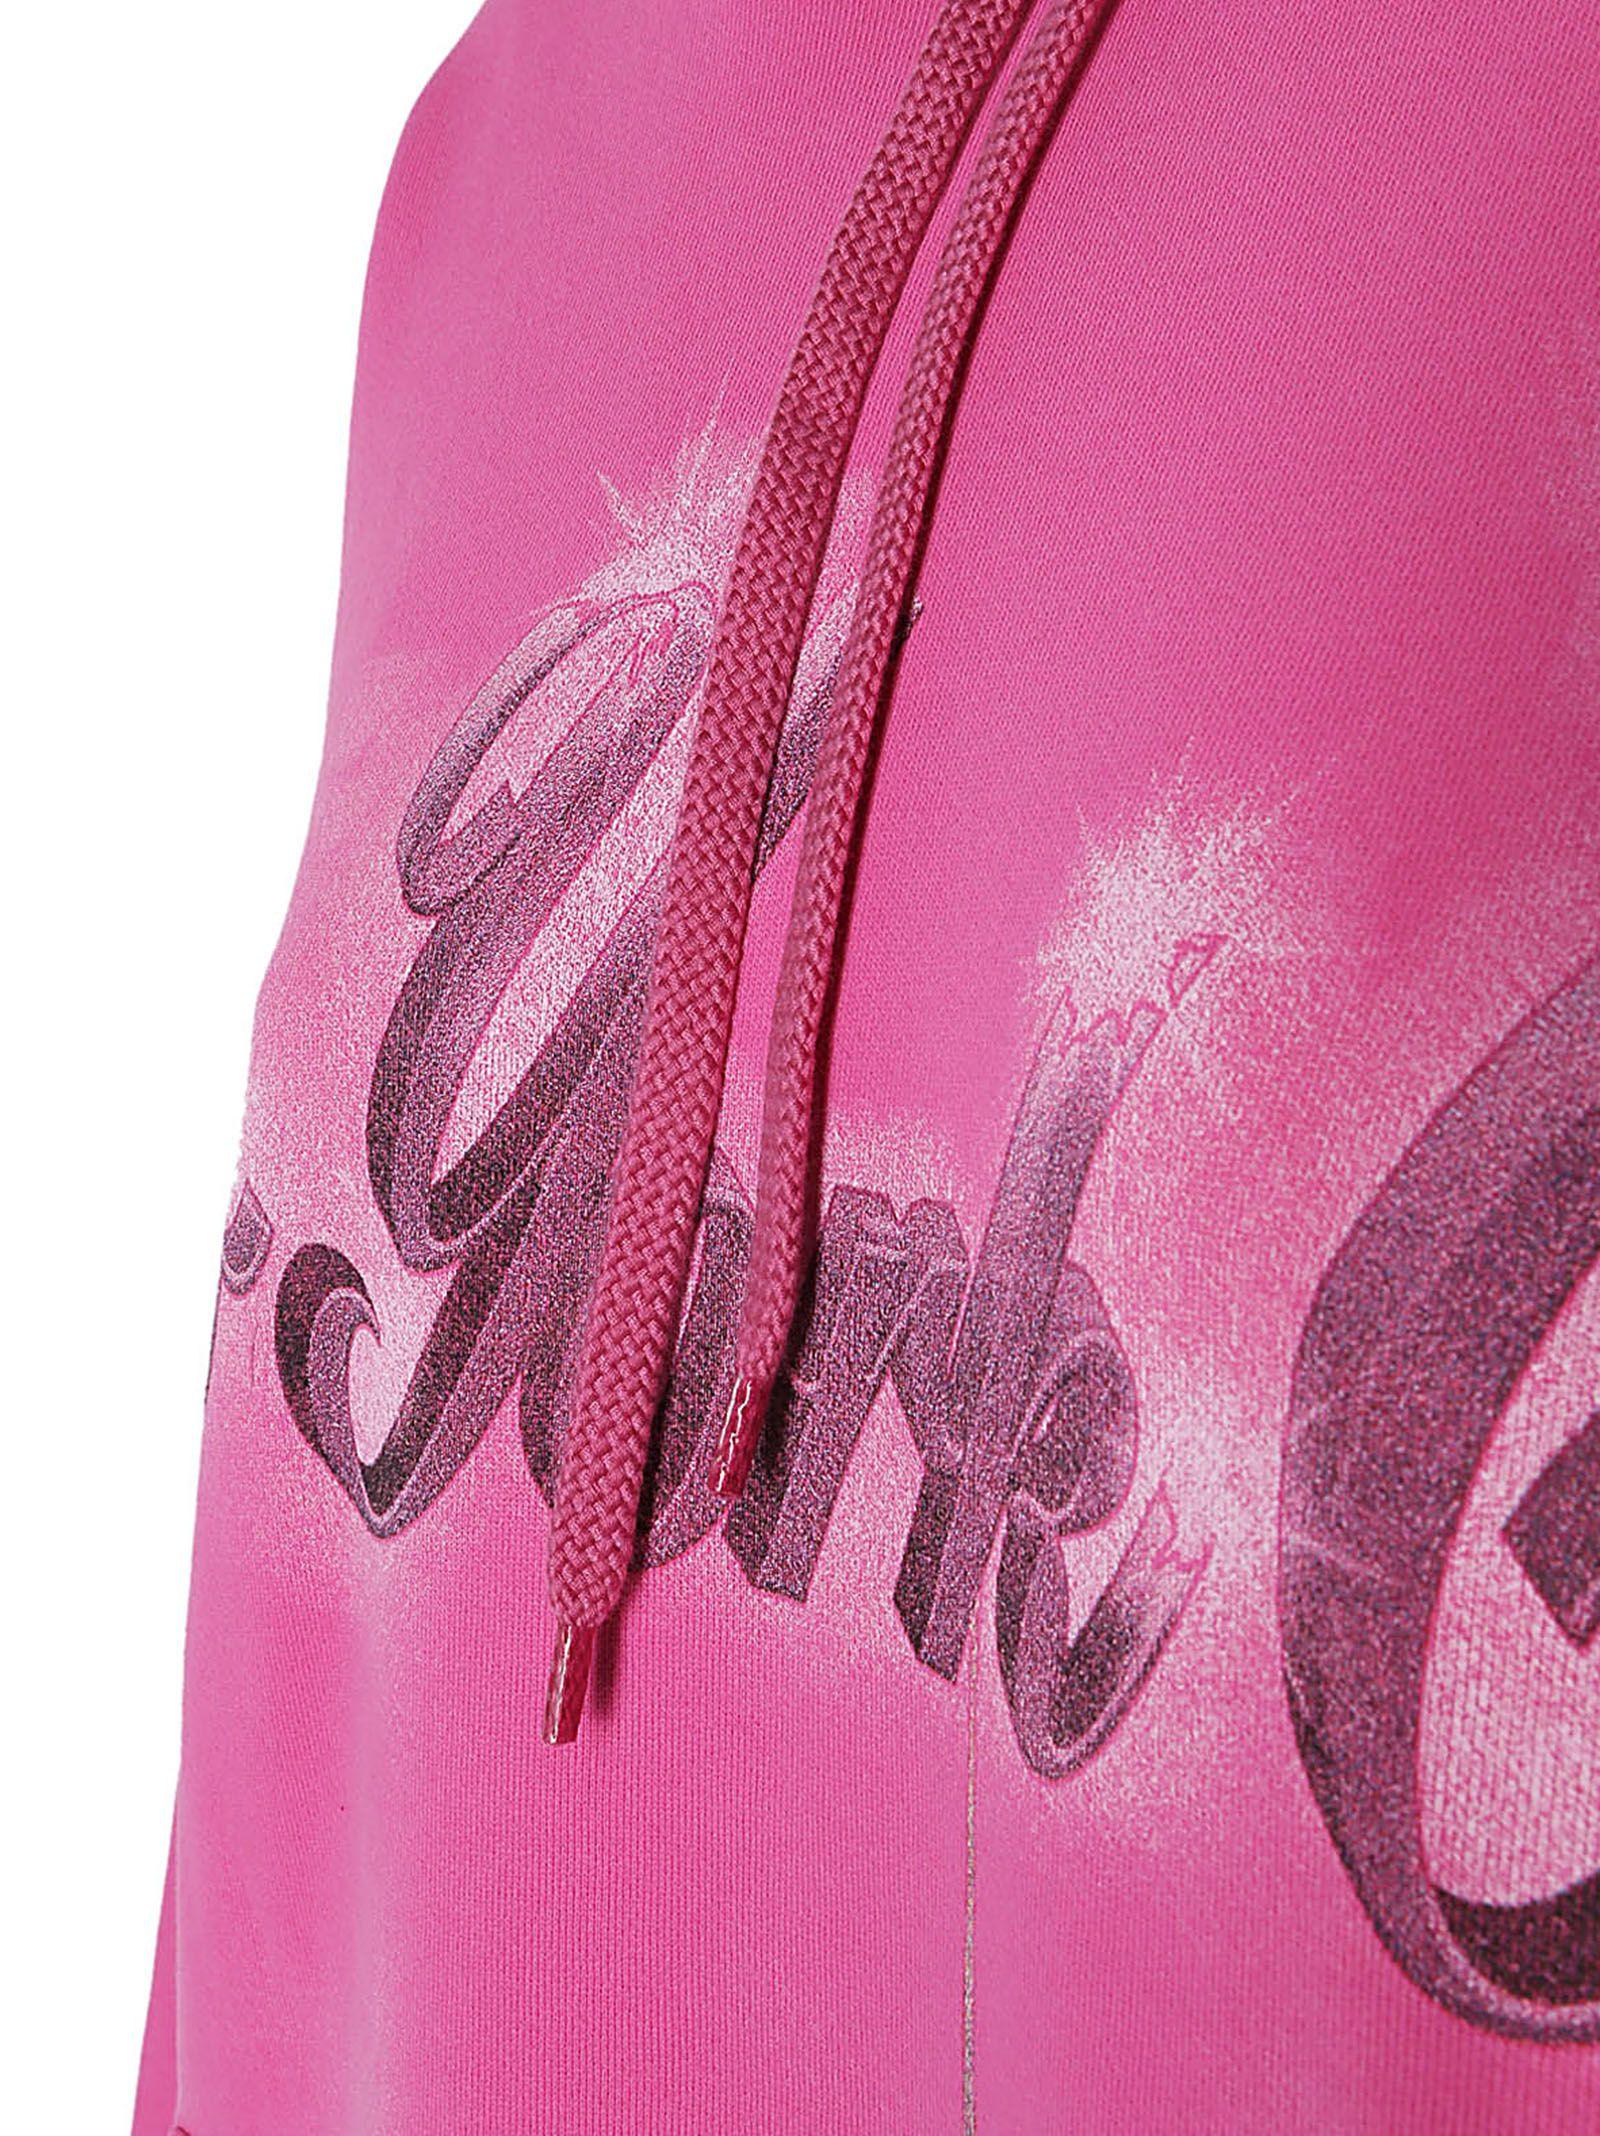 balenciaga hoodie womens pink